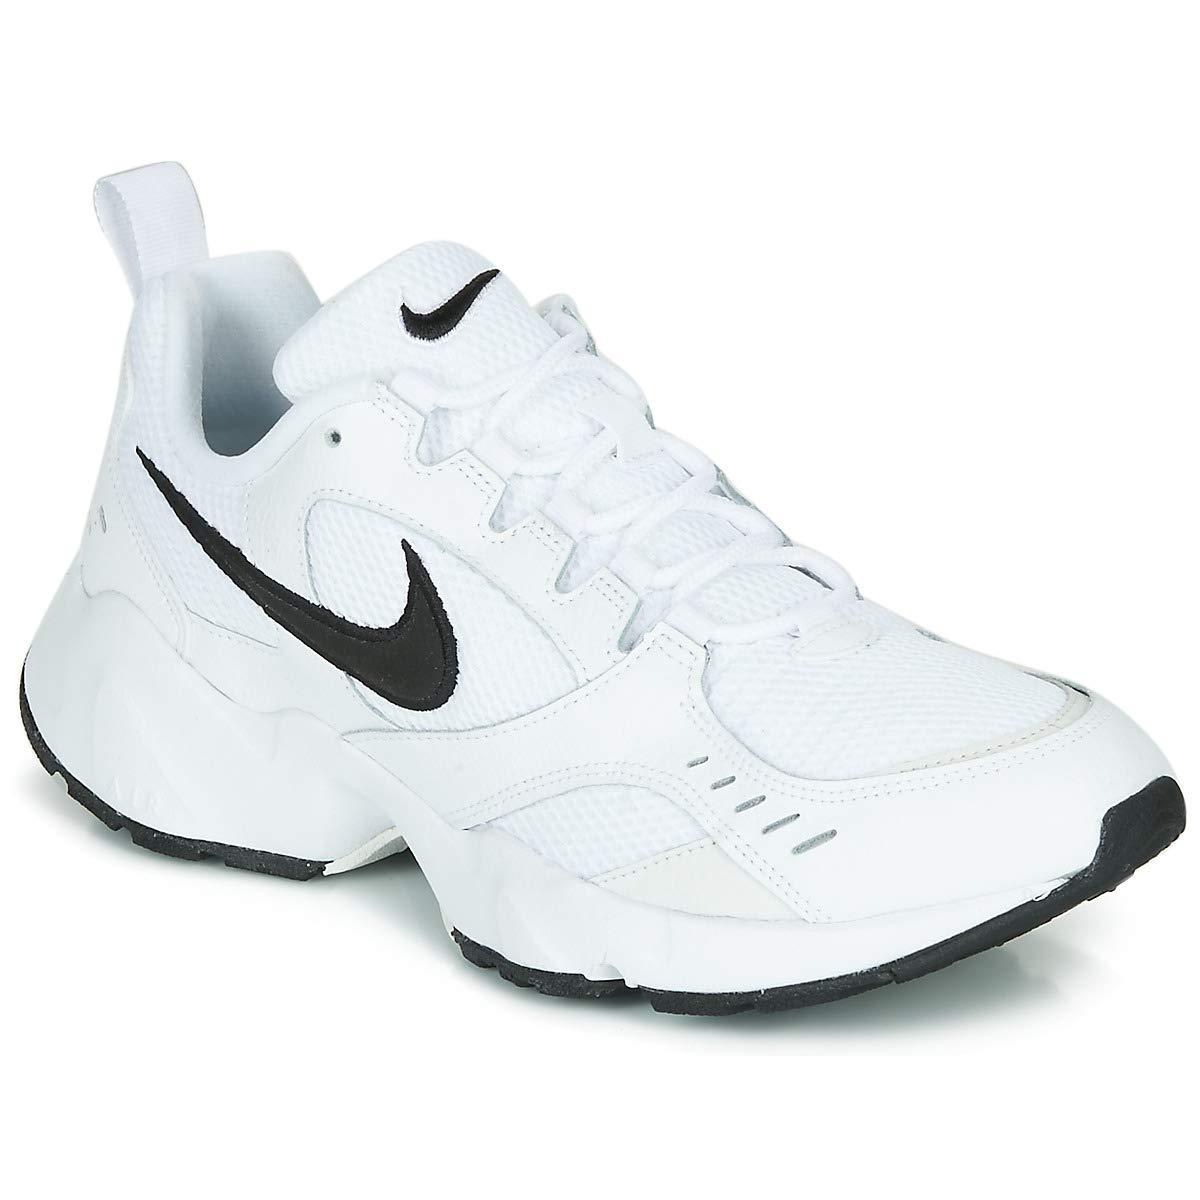 MultiCouleure (blanc noir Platinum Tint 101) Nike Air Heights, Chaussures de Trail Homme 44 EU